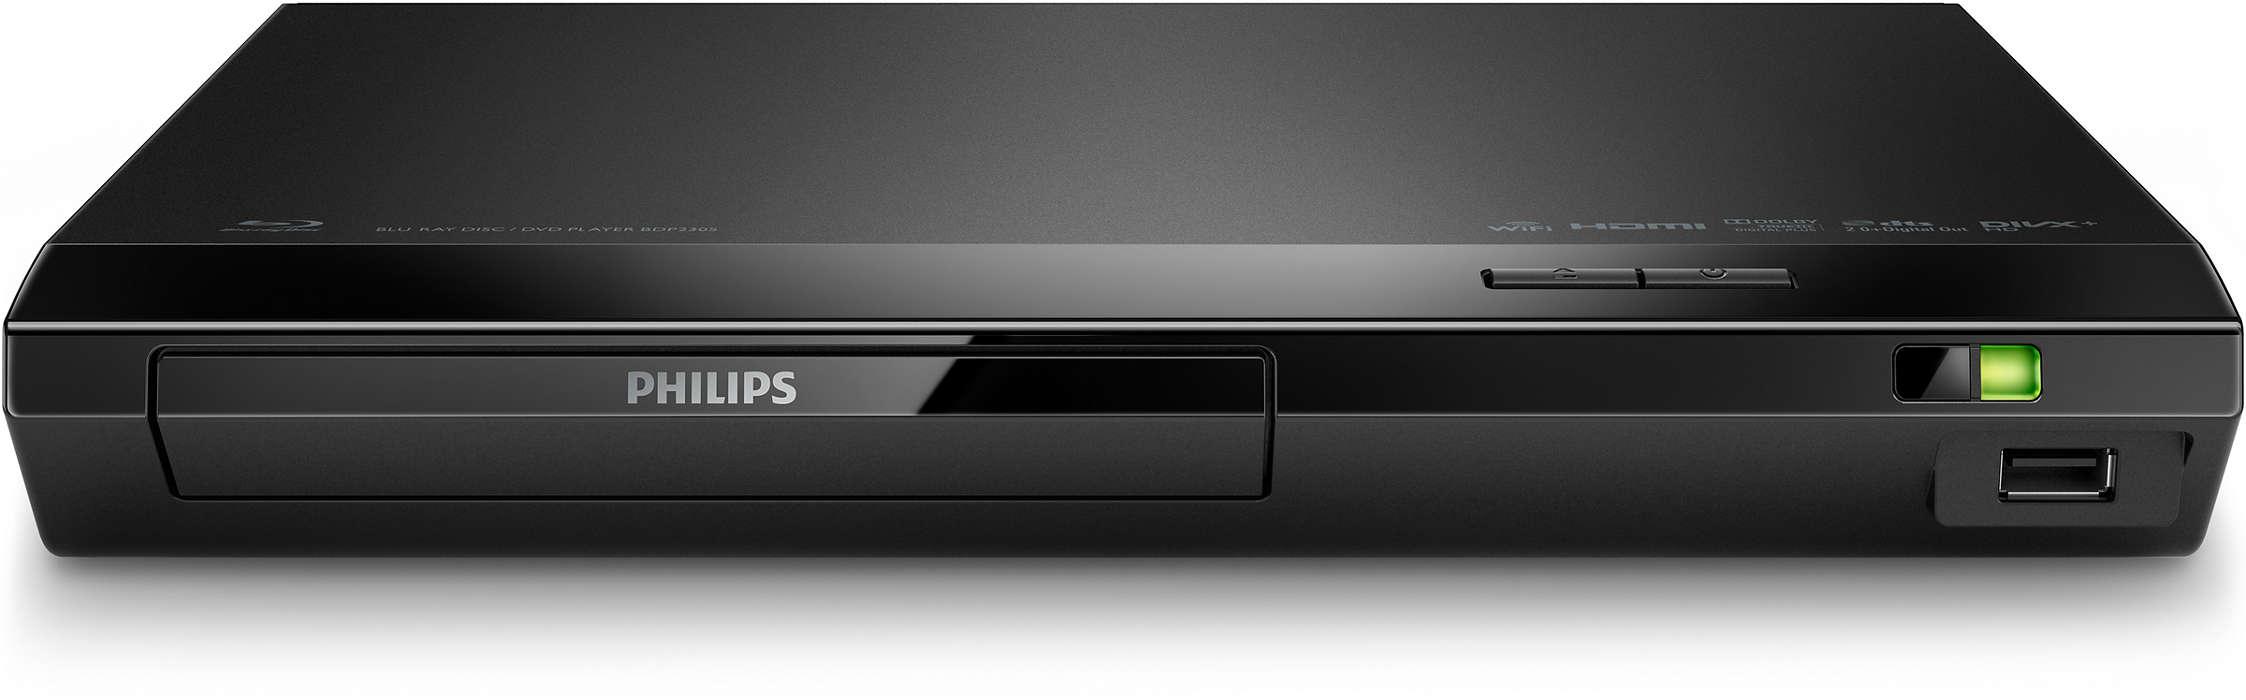 Blu-ray et DVD avec technologie Wi-Fi intégrée